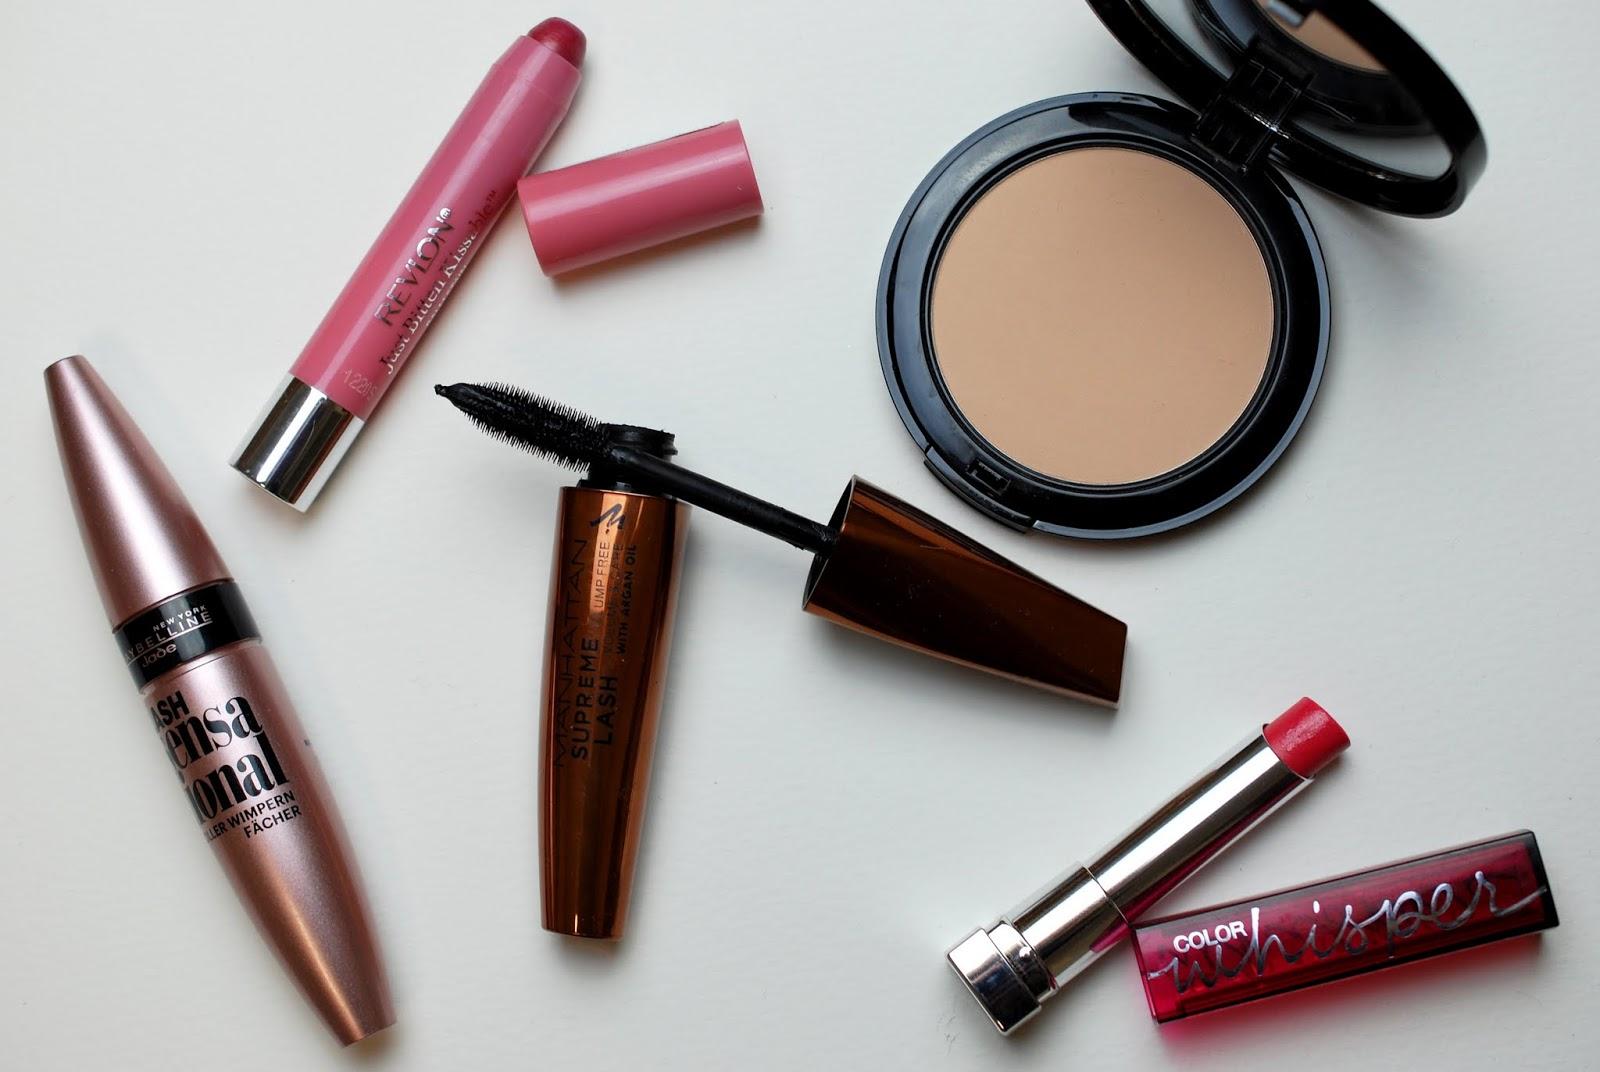 Blogparade: Meine Top 3 Beauty Essentials